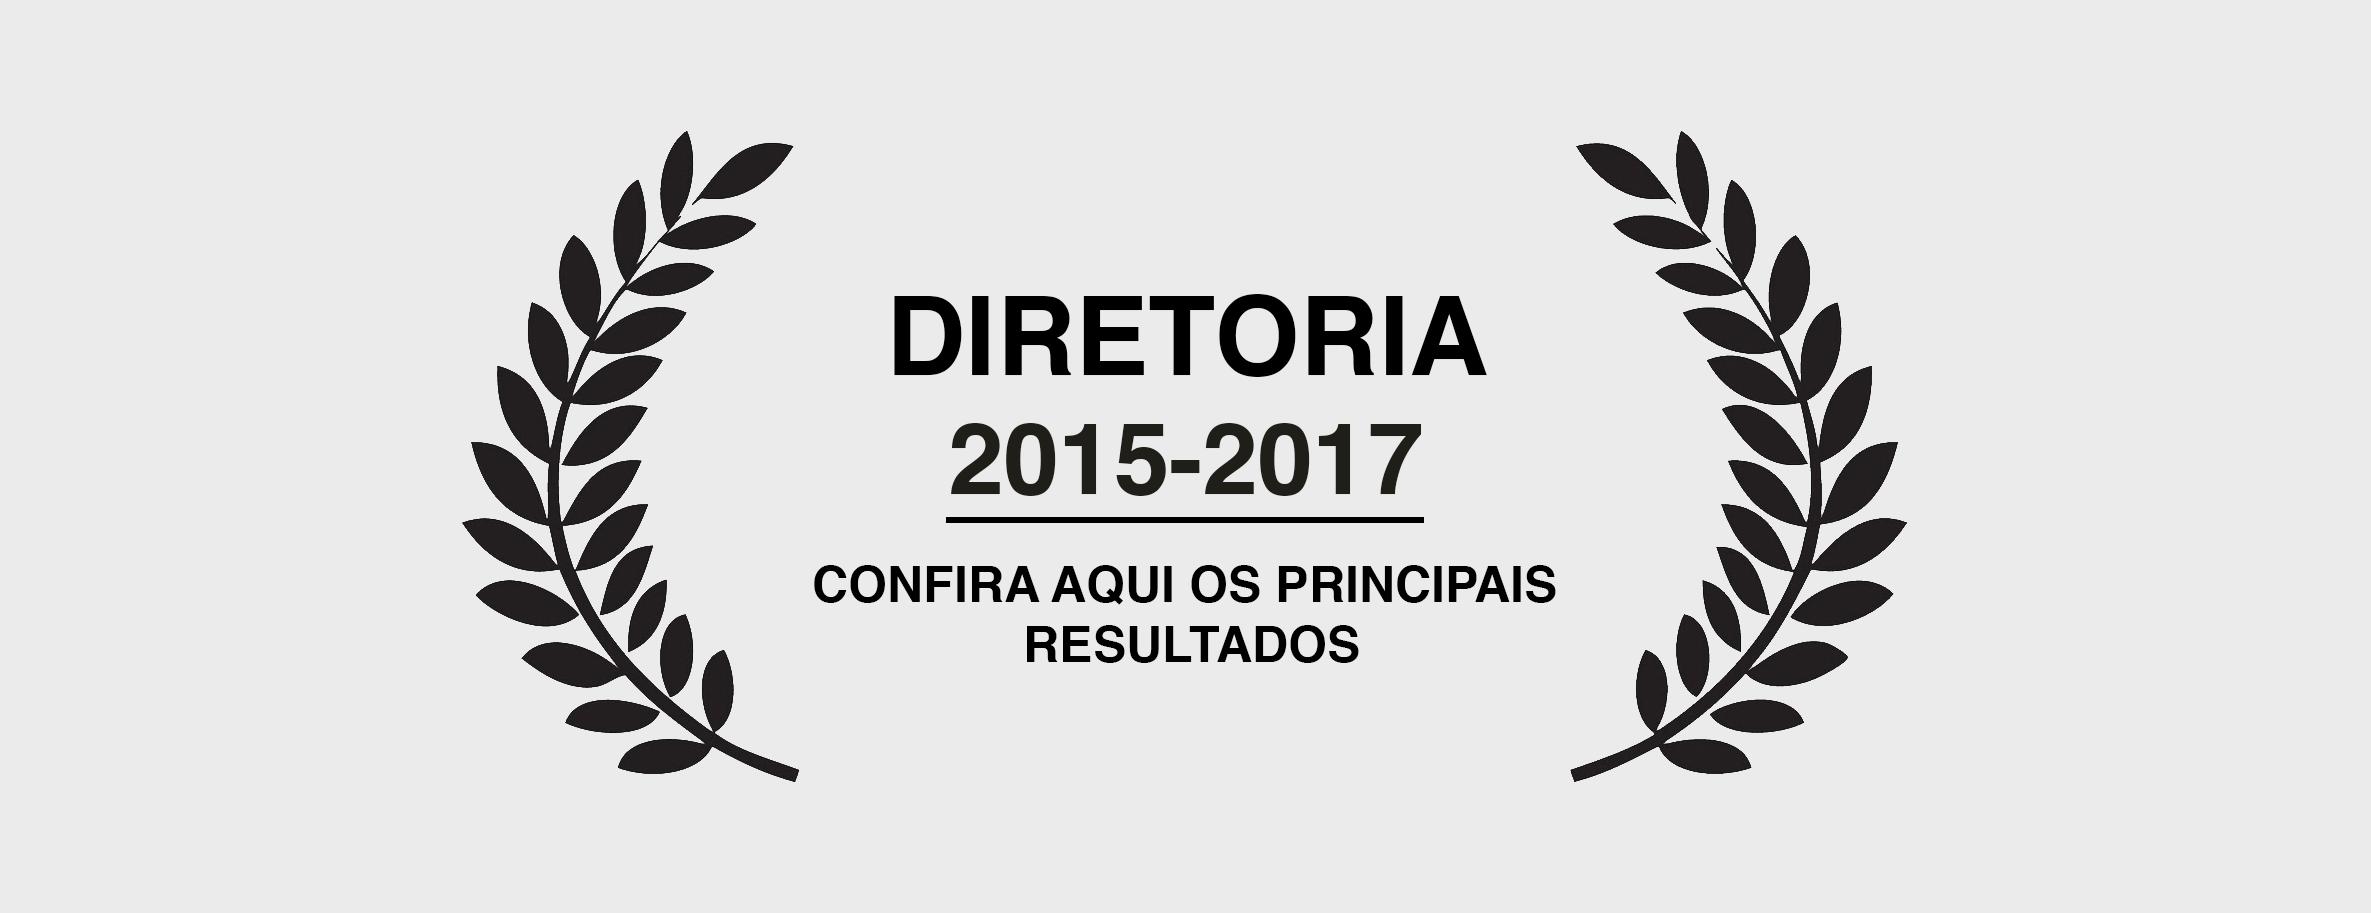 resultados dest 2015-2017.png